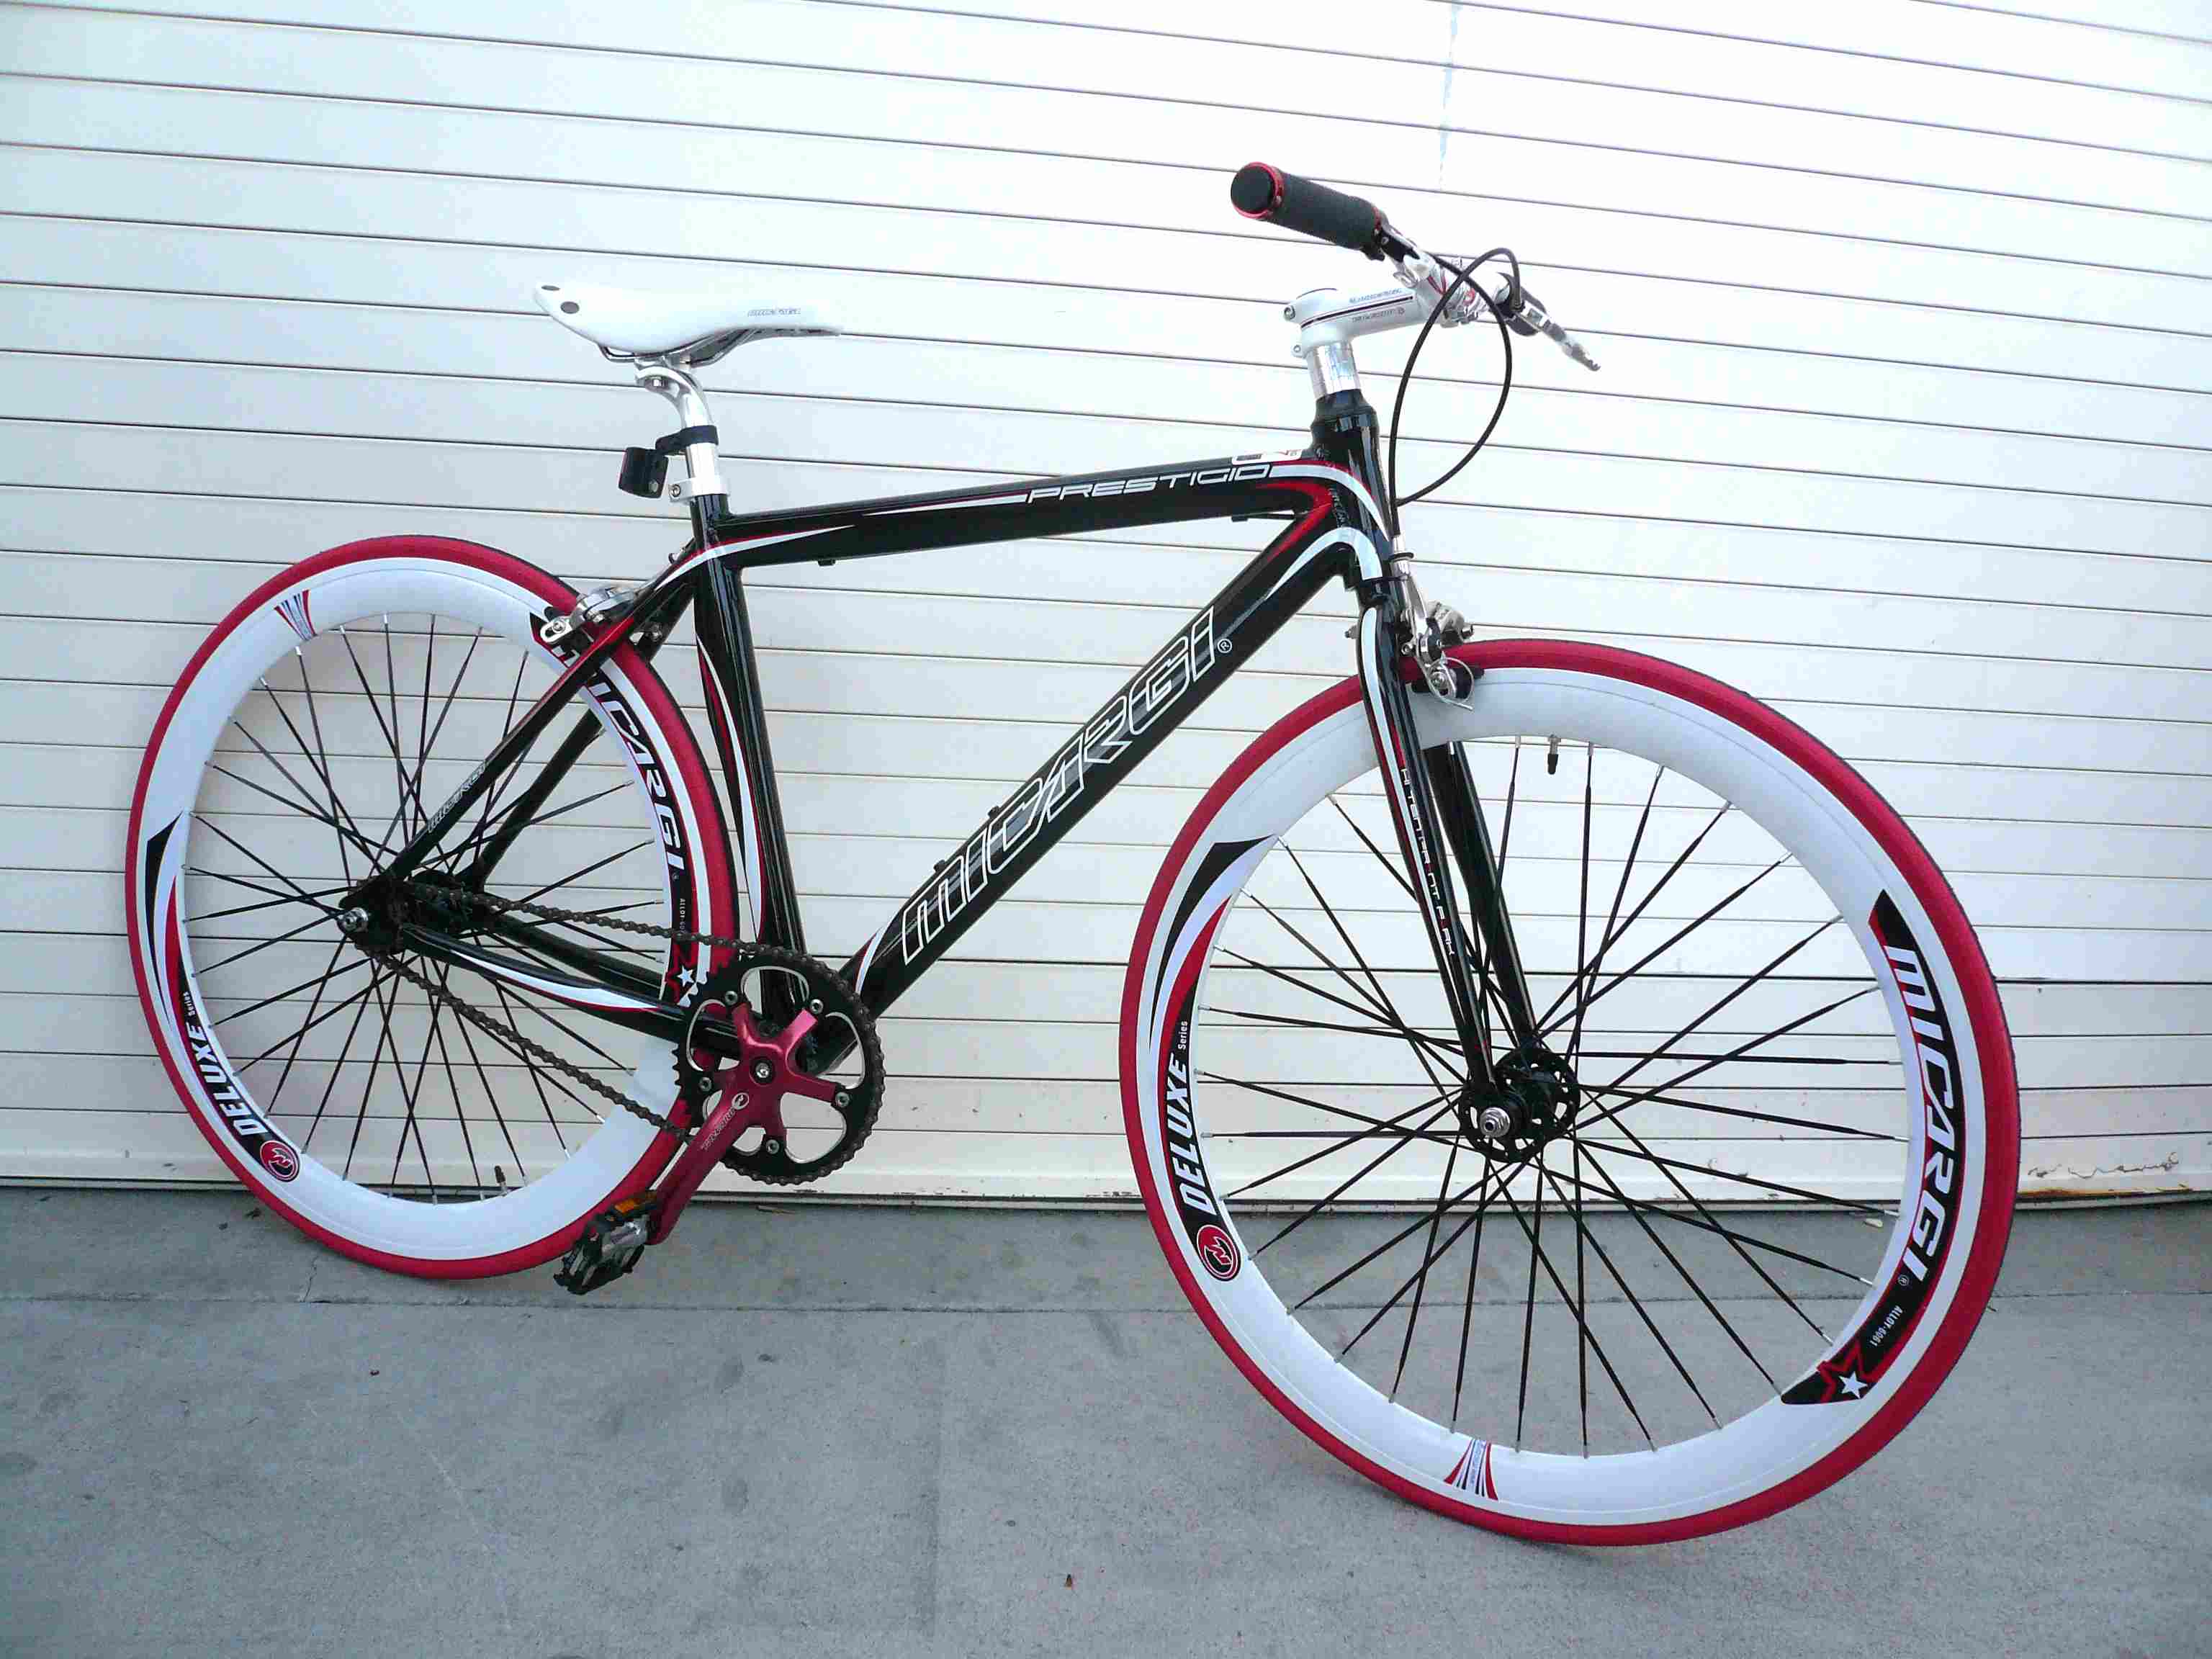 Road Bike Fixed Gear Track Bicycle Alloy Micargi Prestigio